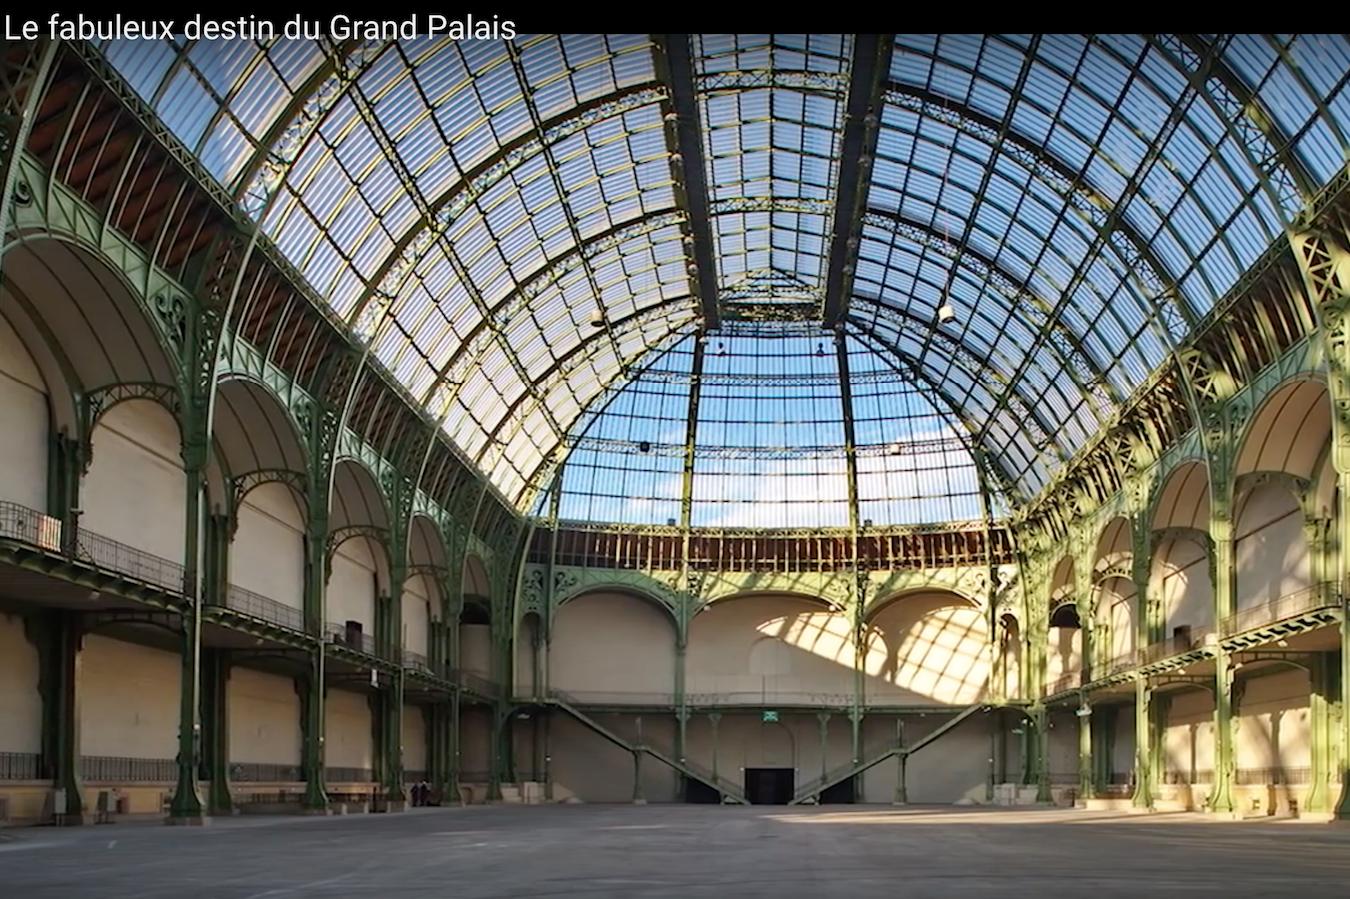 Chanel 出资2500万欧元赞助专属秀场—巴黎大皇宫的翻修工程,正殿入口将以品牌创始人命名